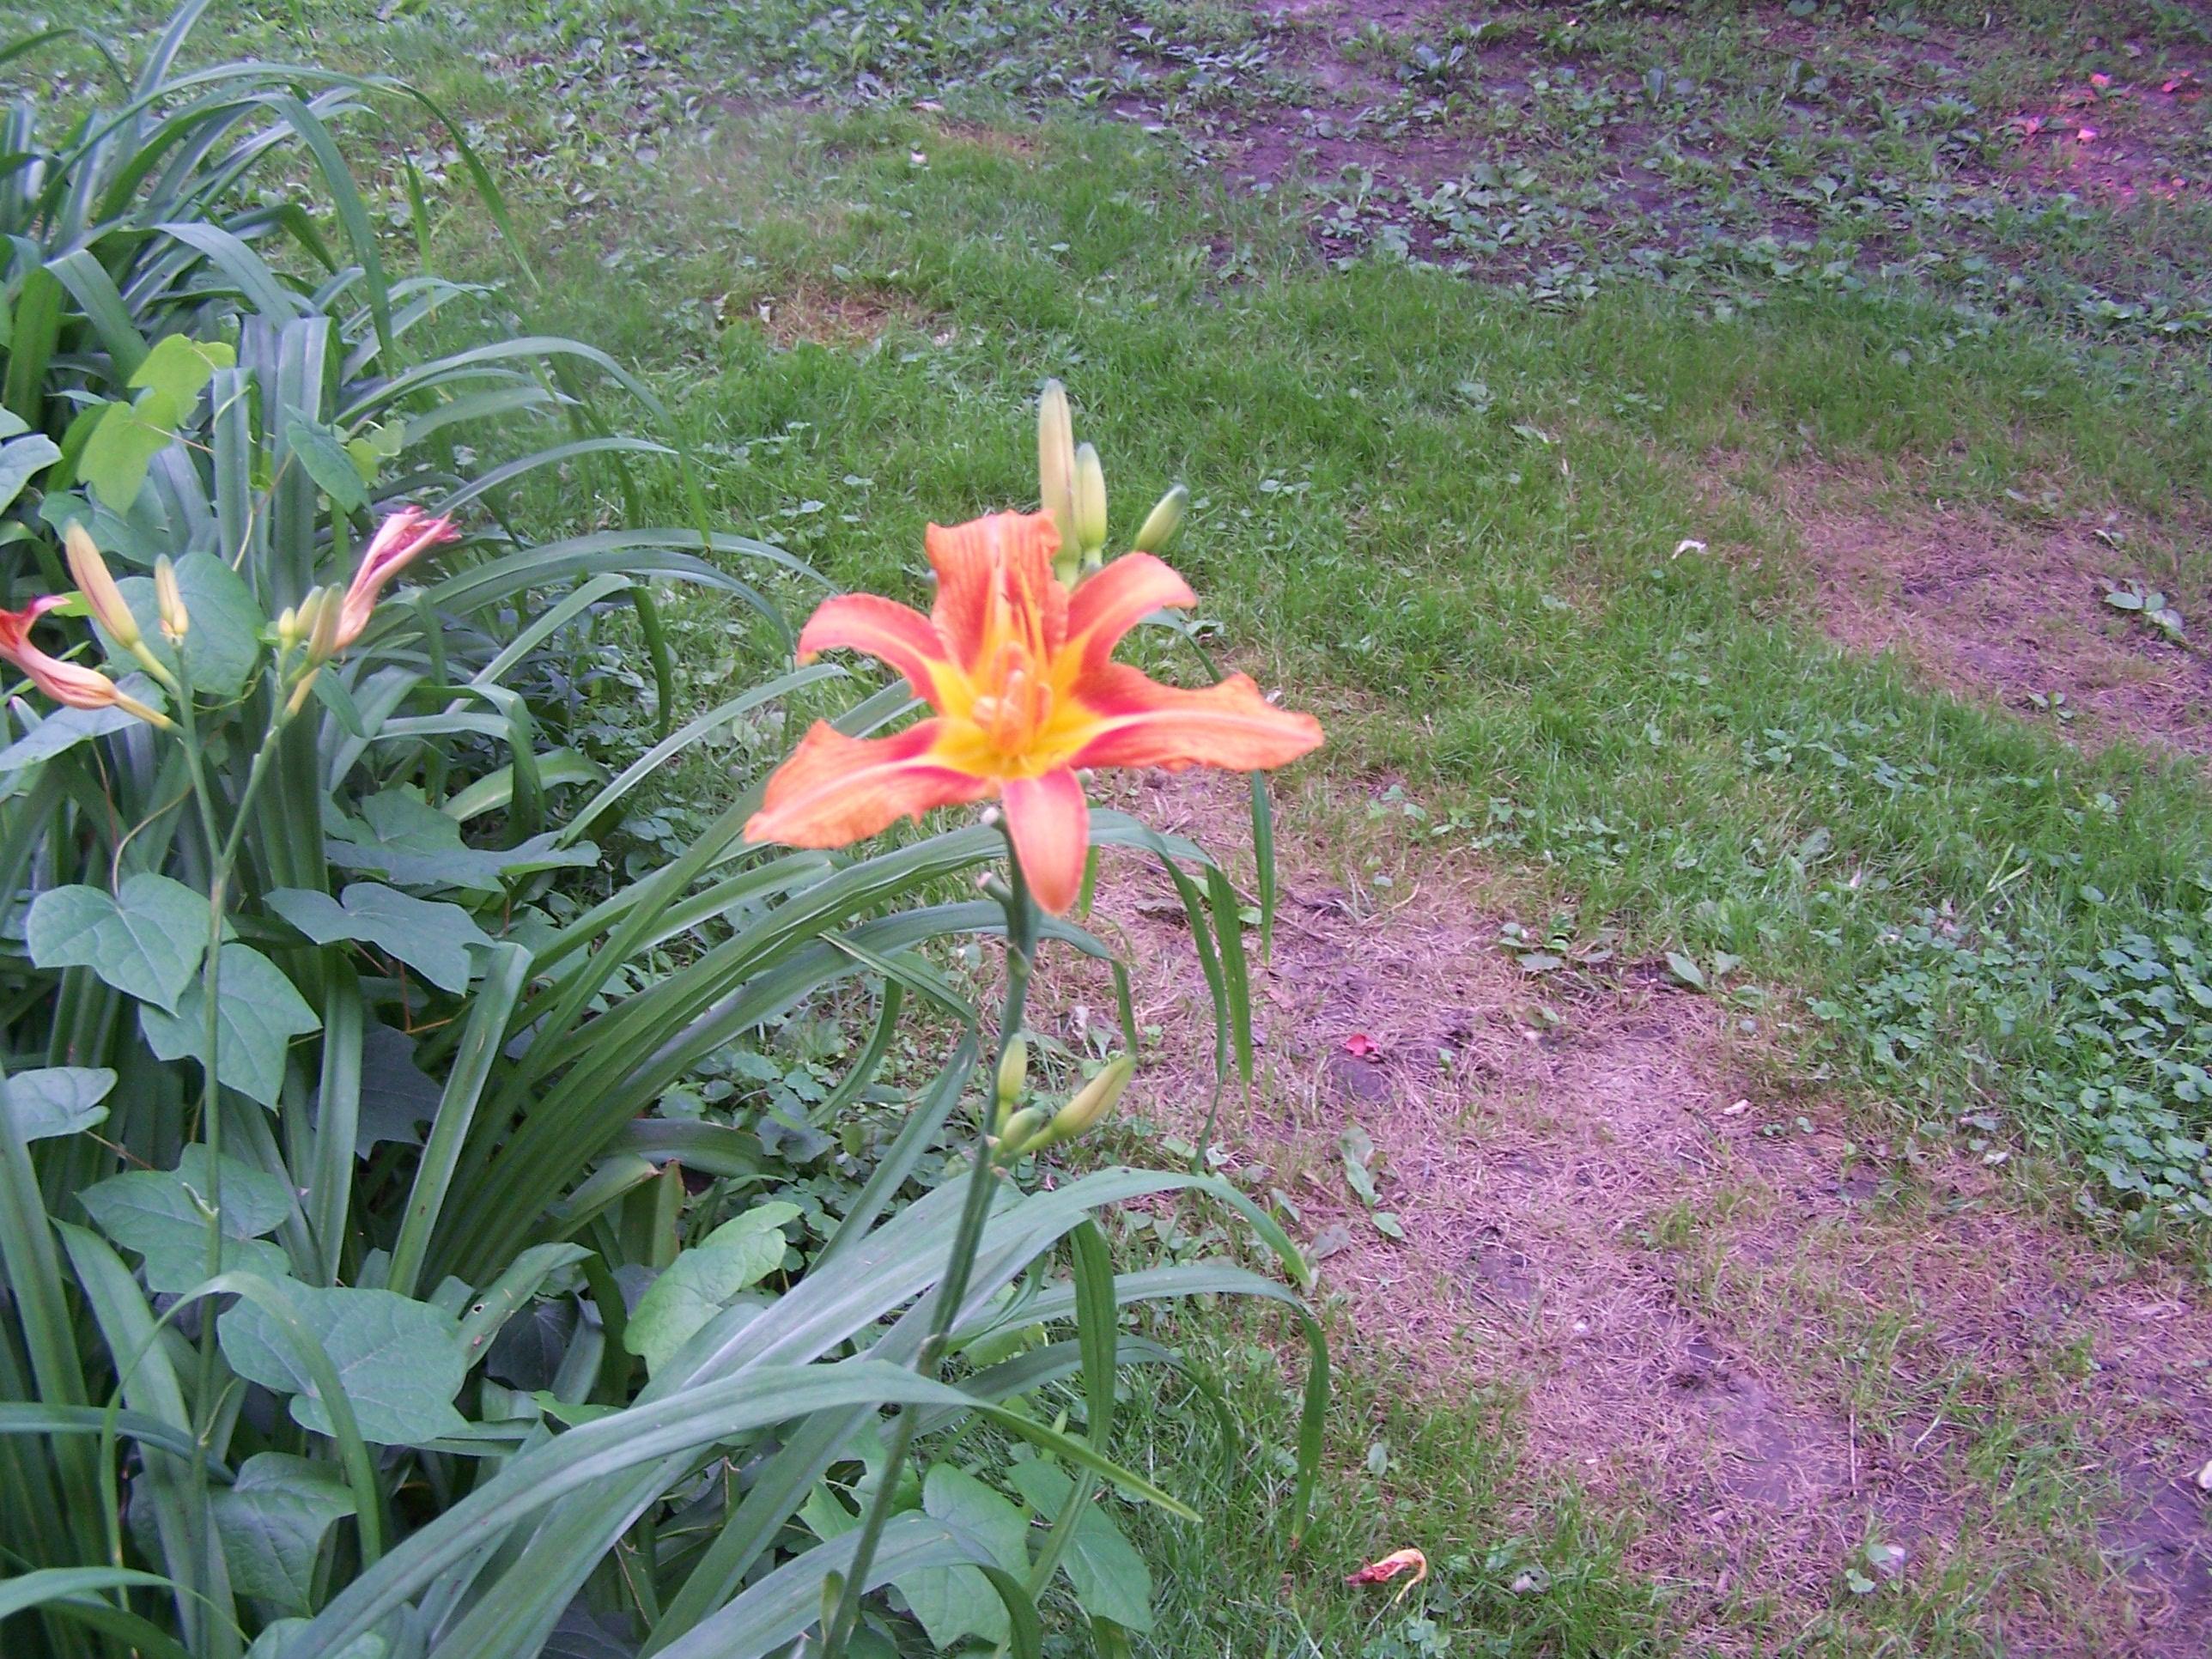 Flowers, Gilligan, Muddy Dogs 012